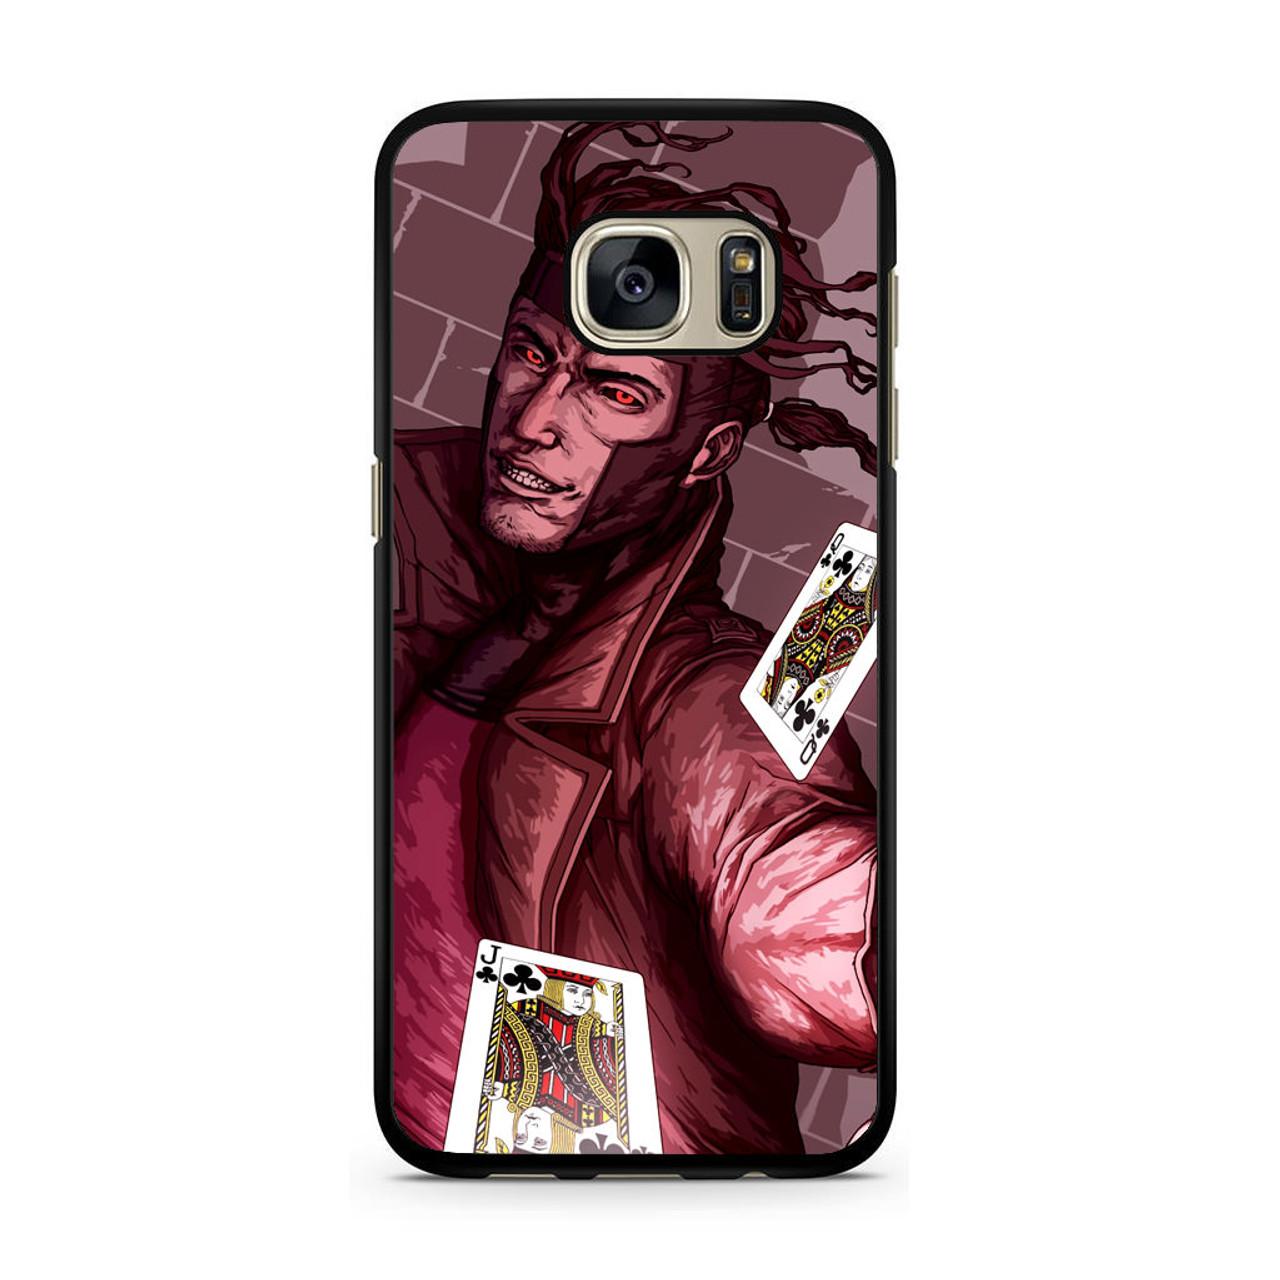 quality design 719c0 e7363 X Men Gambit Samsung Galaxy S7 Case